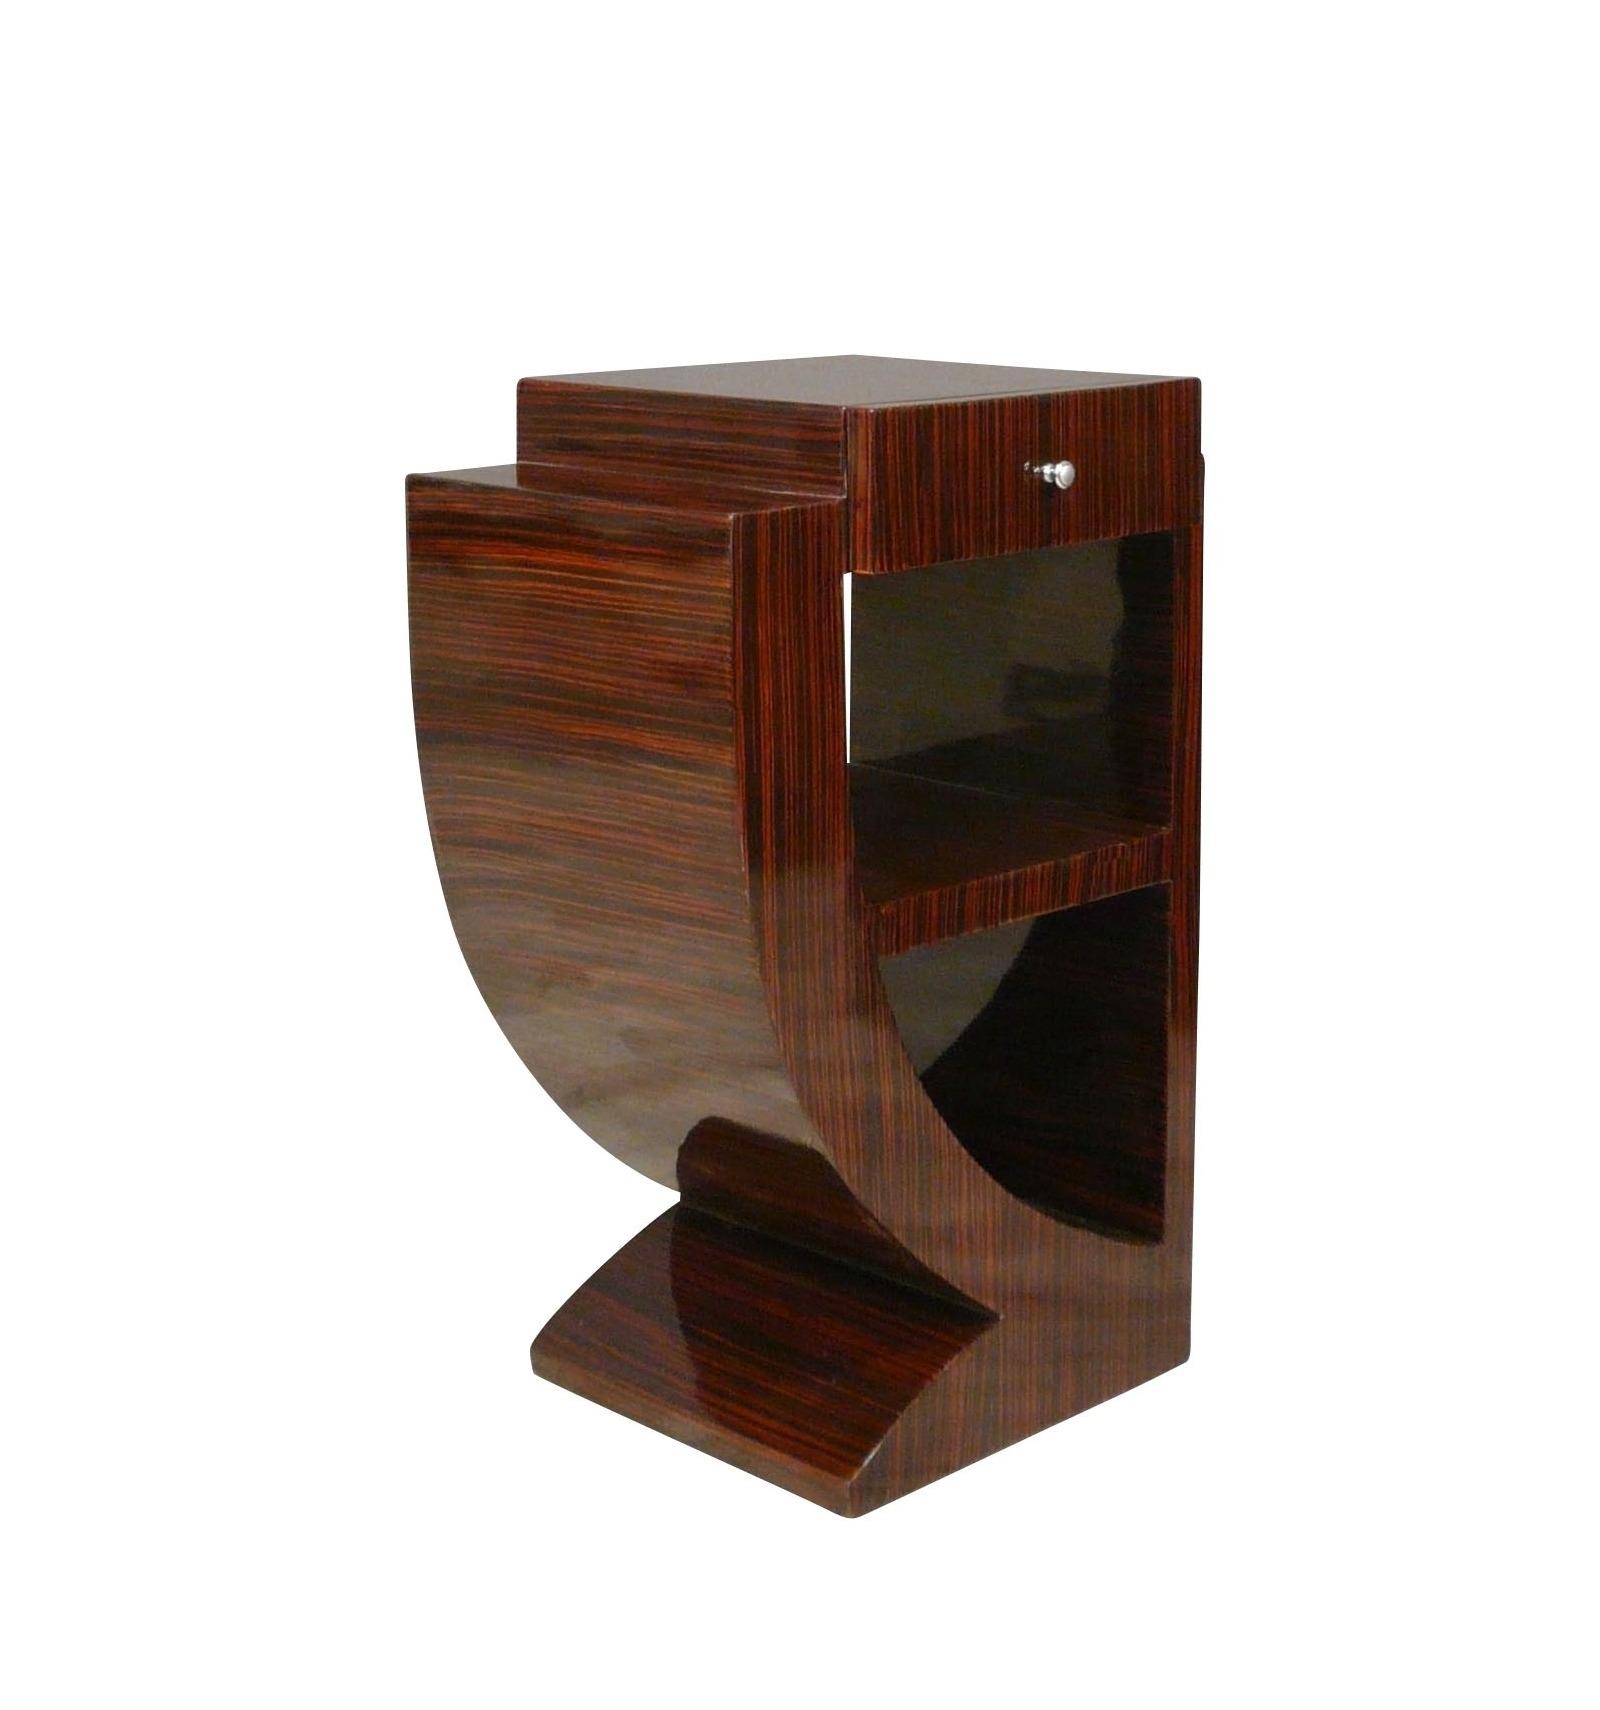 tische deko kunst eingelegtes palisander m bel art deco stil 1920. Black Bedroom Furniture Sets. Home Design Ideas